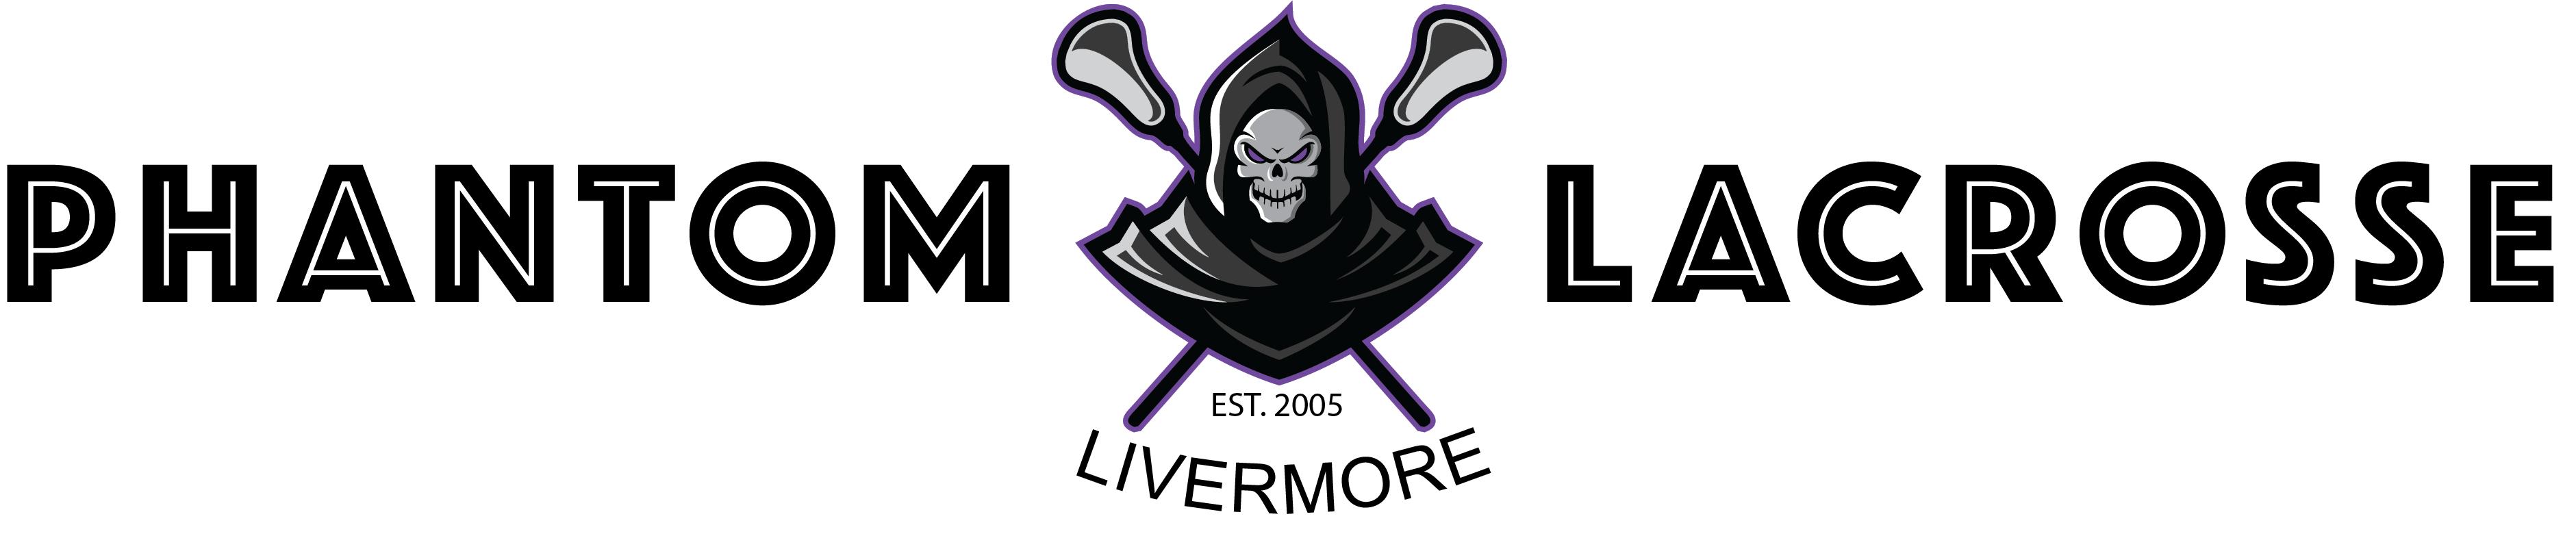 Livermore Phantom Lacrosse, Lacrosse, Goal, Field